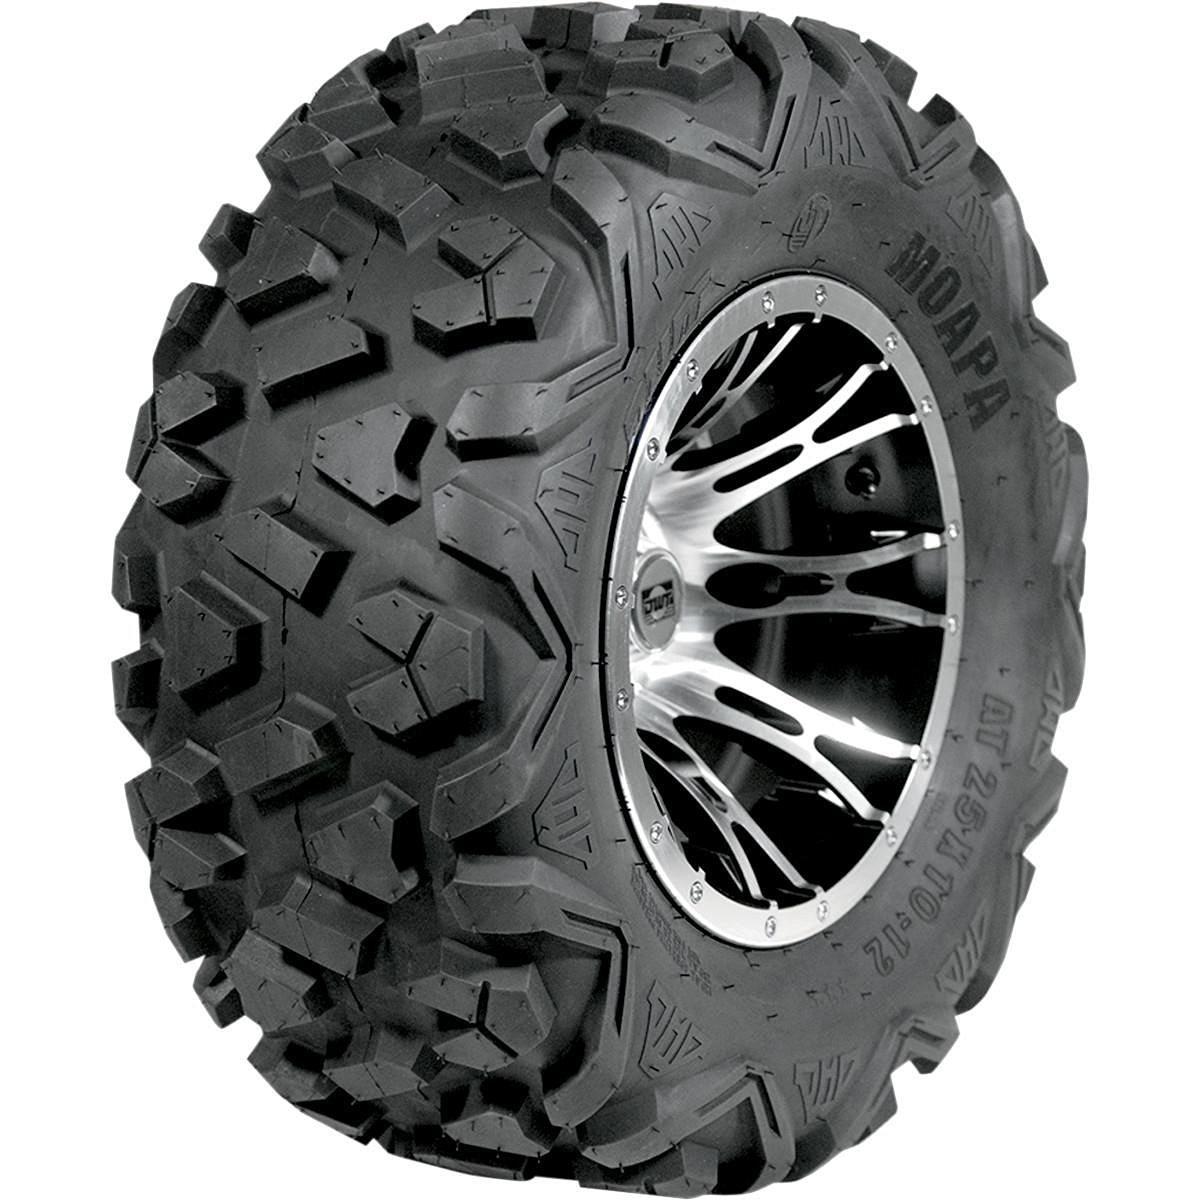 Douglas Wheel Moapa Run-Flat Utility Tire - 26x9x12 , Position: Front/Rear, Rim Size: 12, Tire Application: All-Terrain, Tire Size: 26x9x12, Tire Type: ATV/UTV, Tire Ply: 12 UT-263-12